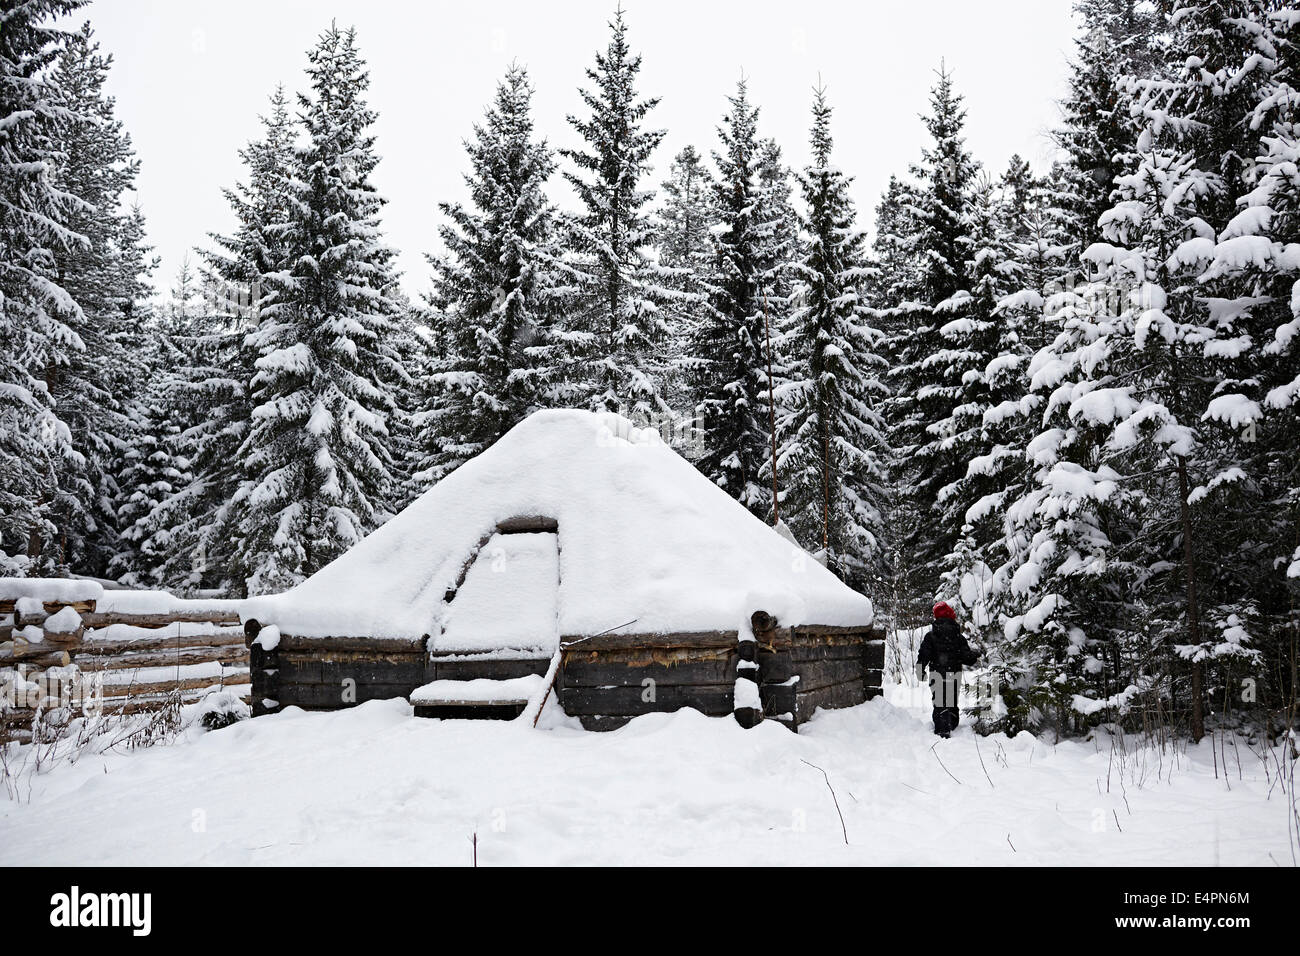 UMEA, Northern Sweden. home Sami indigenous people. - Stock Image